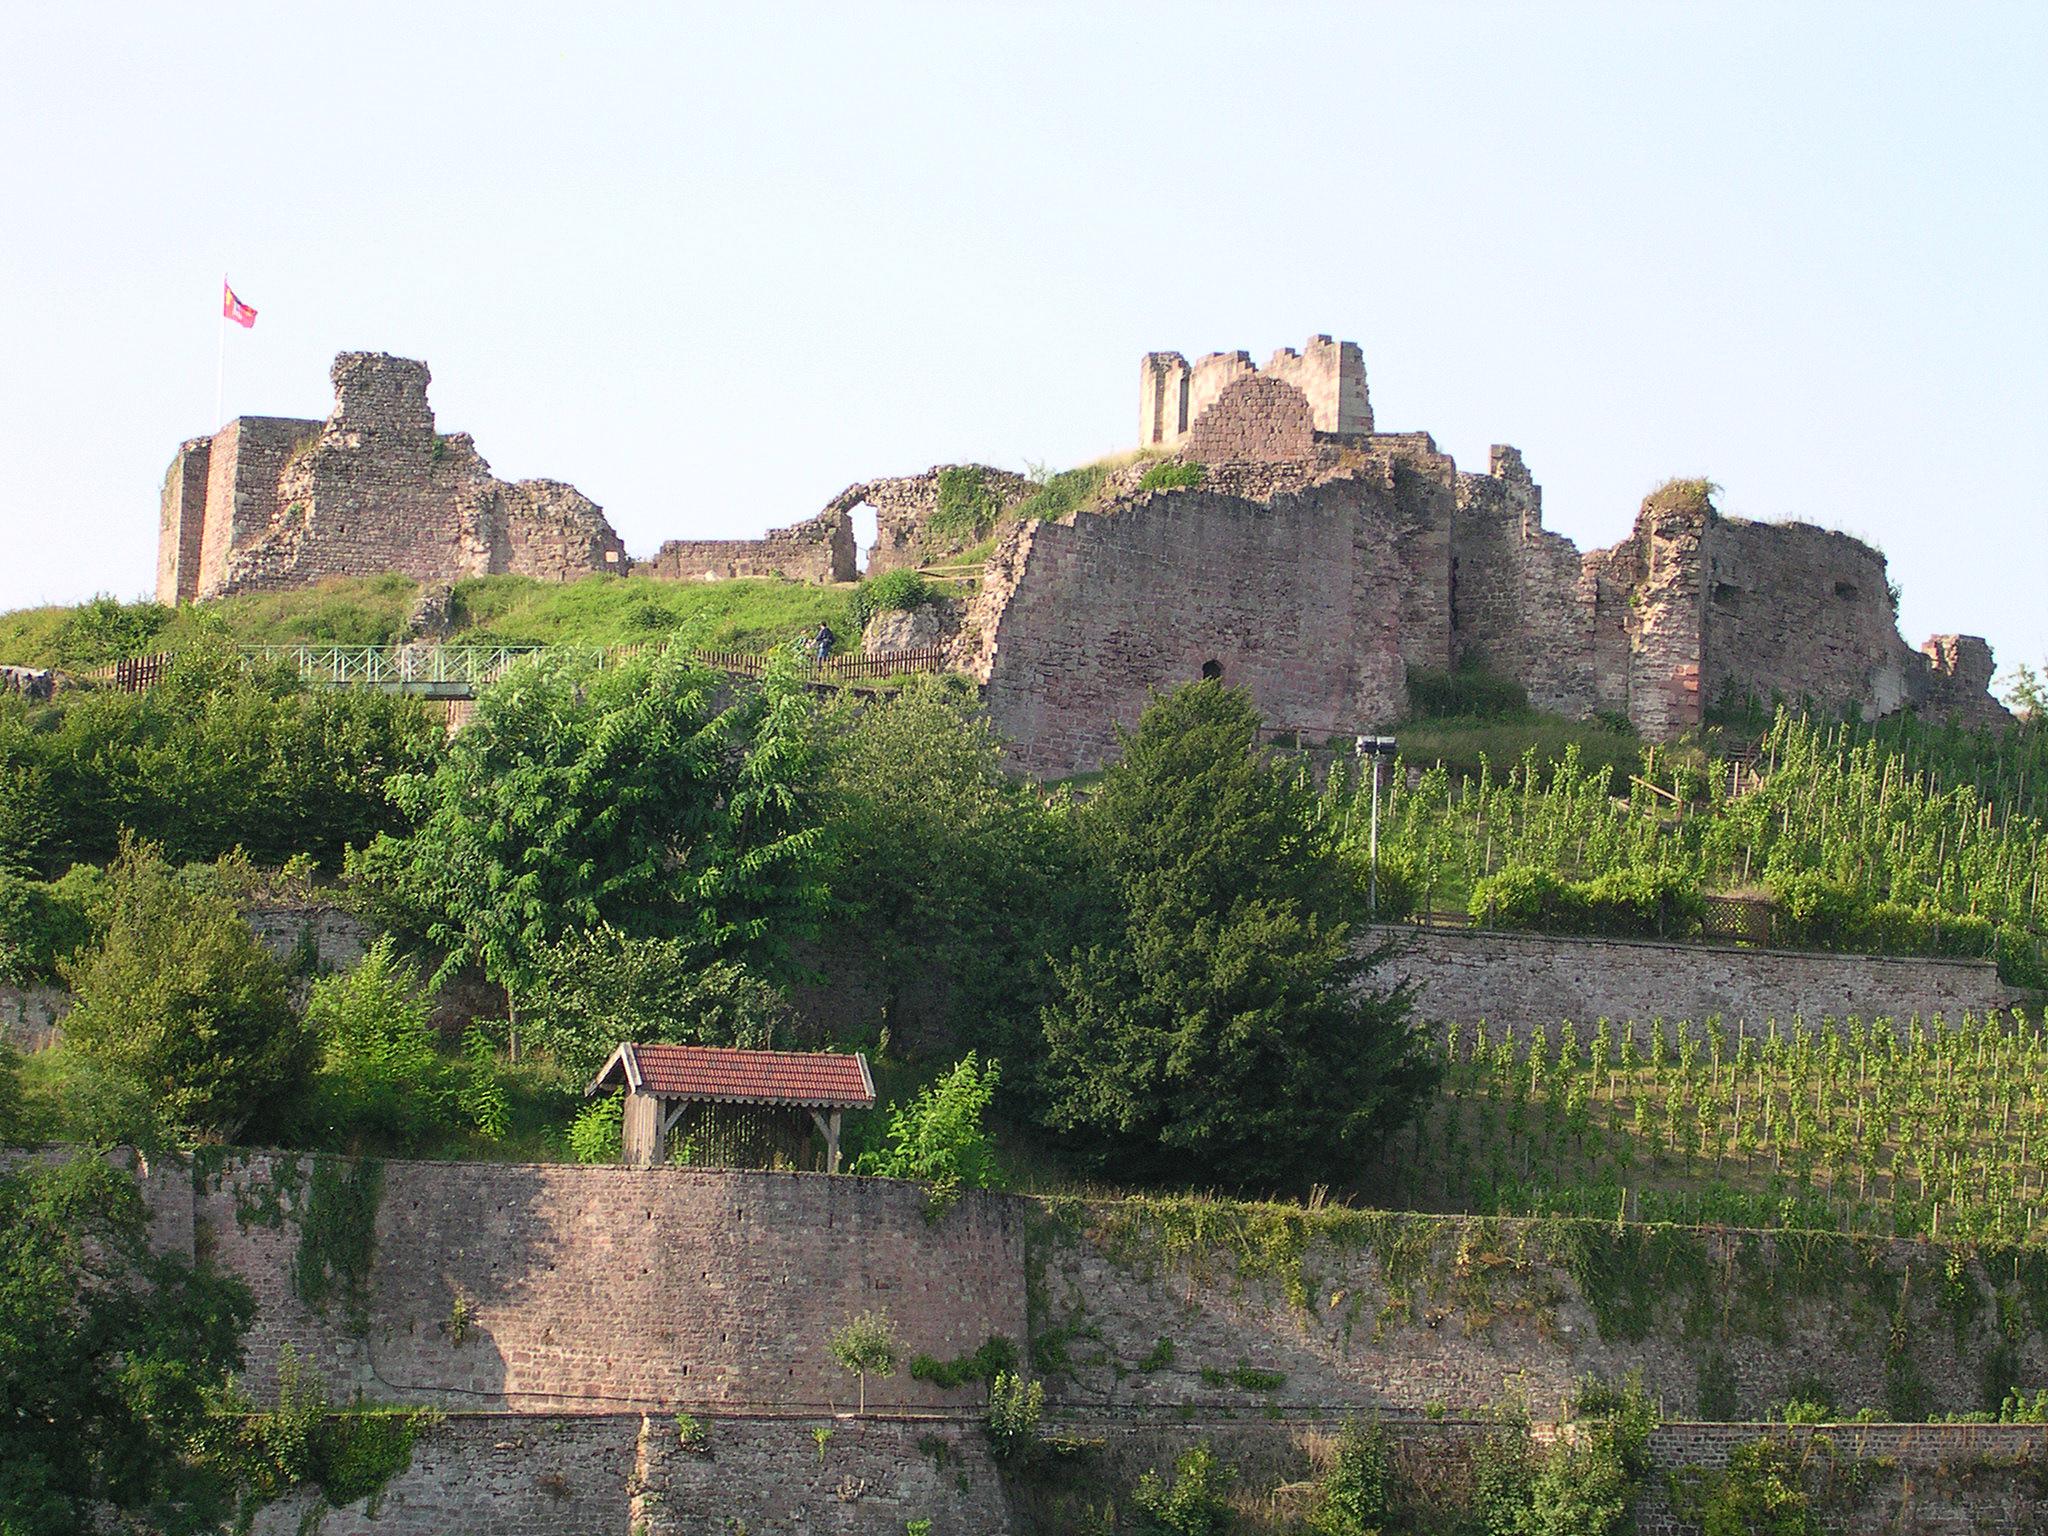 Epinal_chateau1.jpg